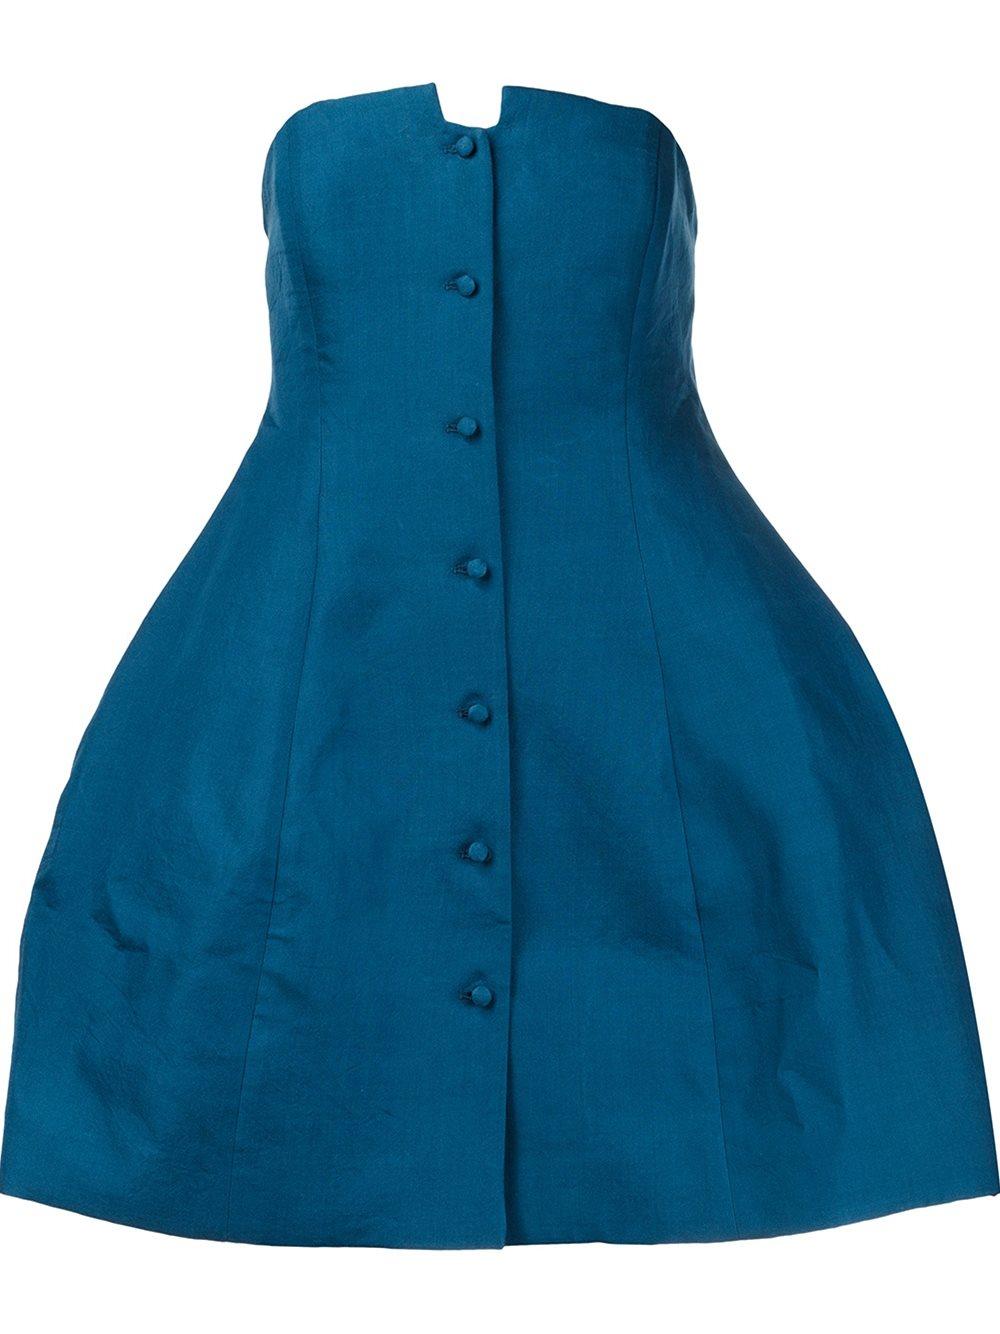 Rosie assoulin 'lamp' Top in Blue